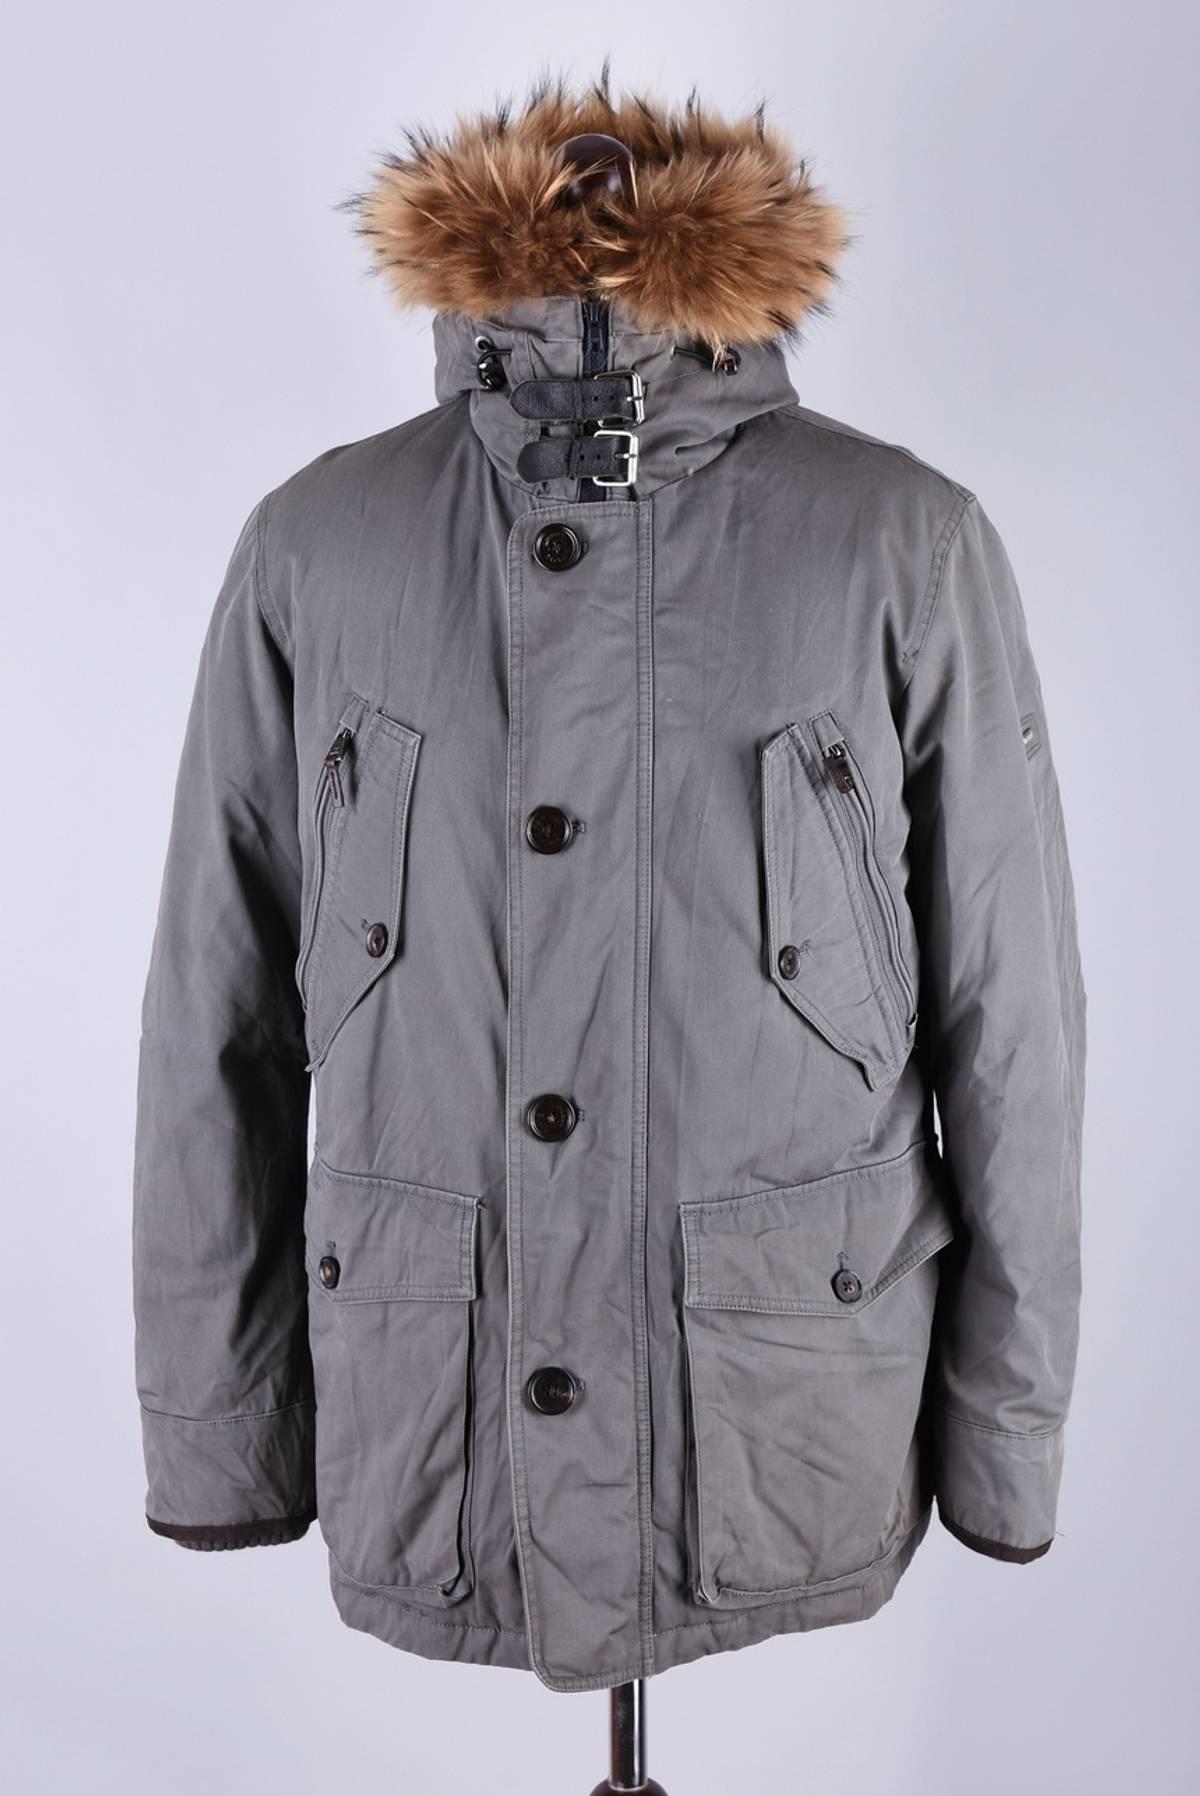 3787b91f3 Hackett Hackett London Arctic Parka Jacket Size M $229